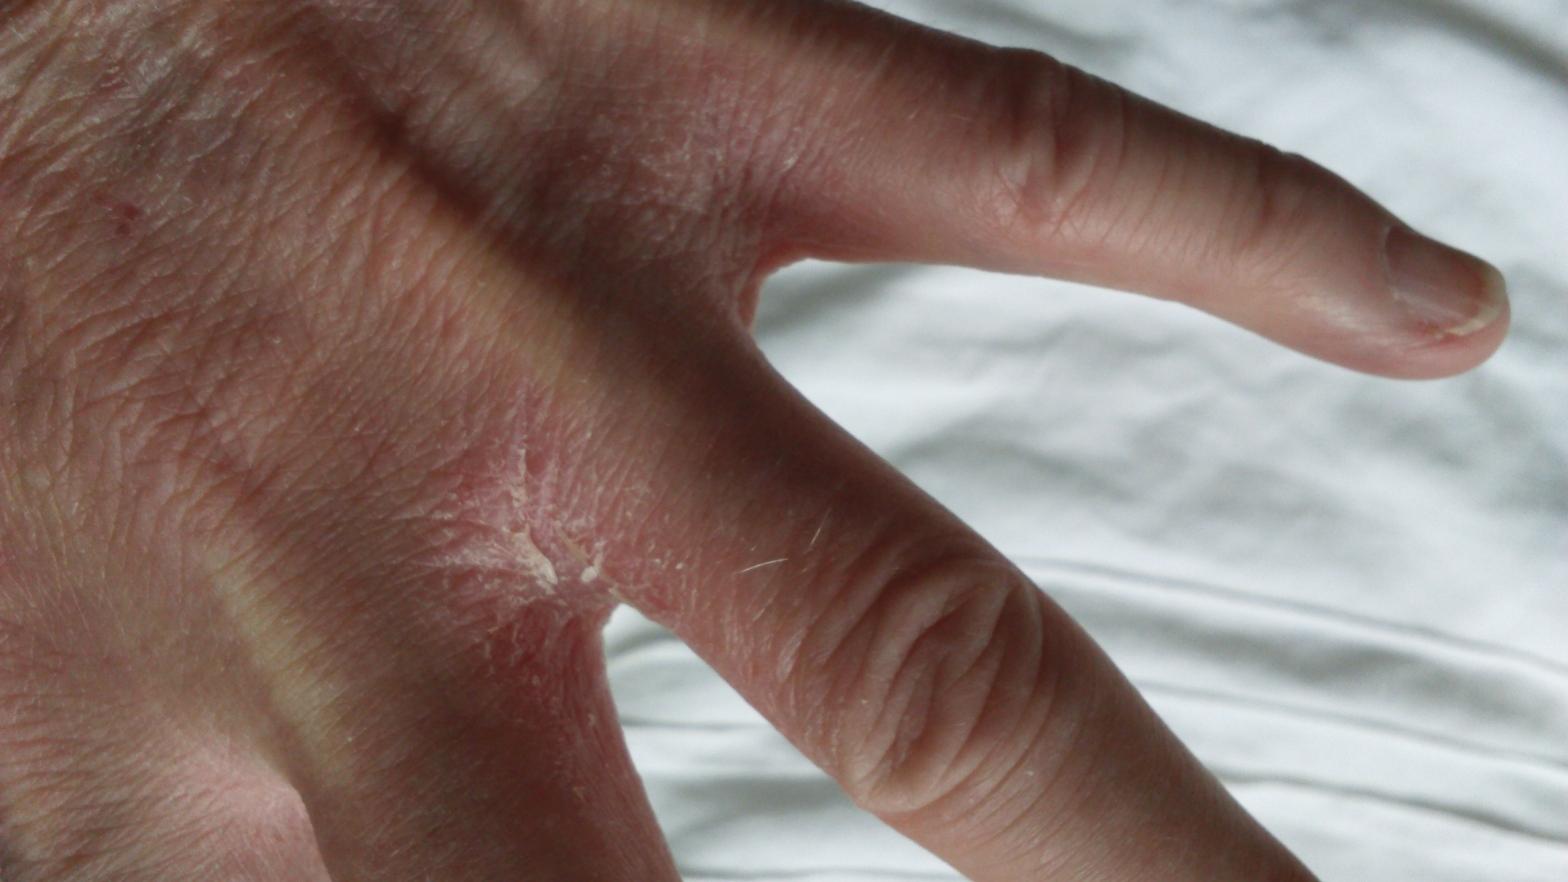 Eczema hand dry and cracking